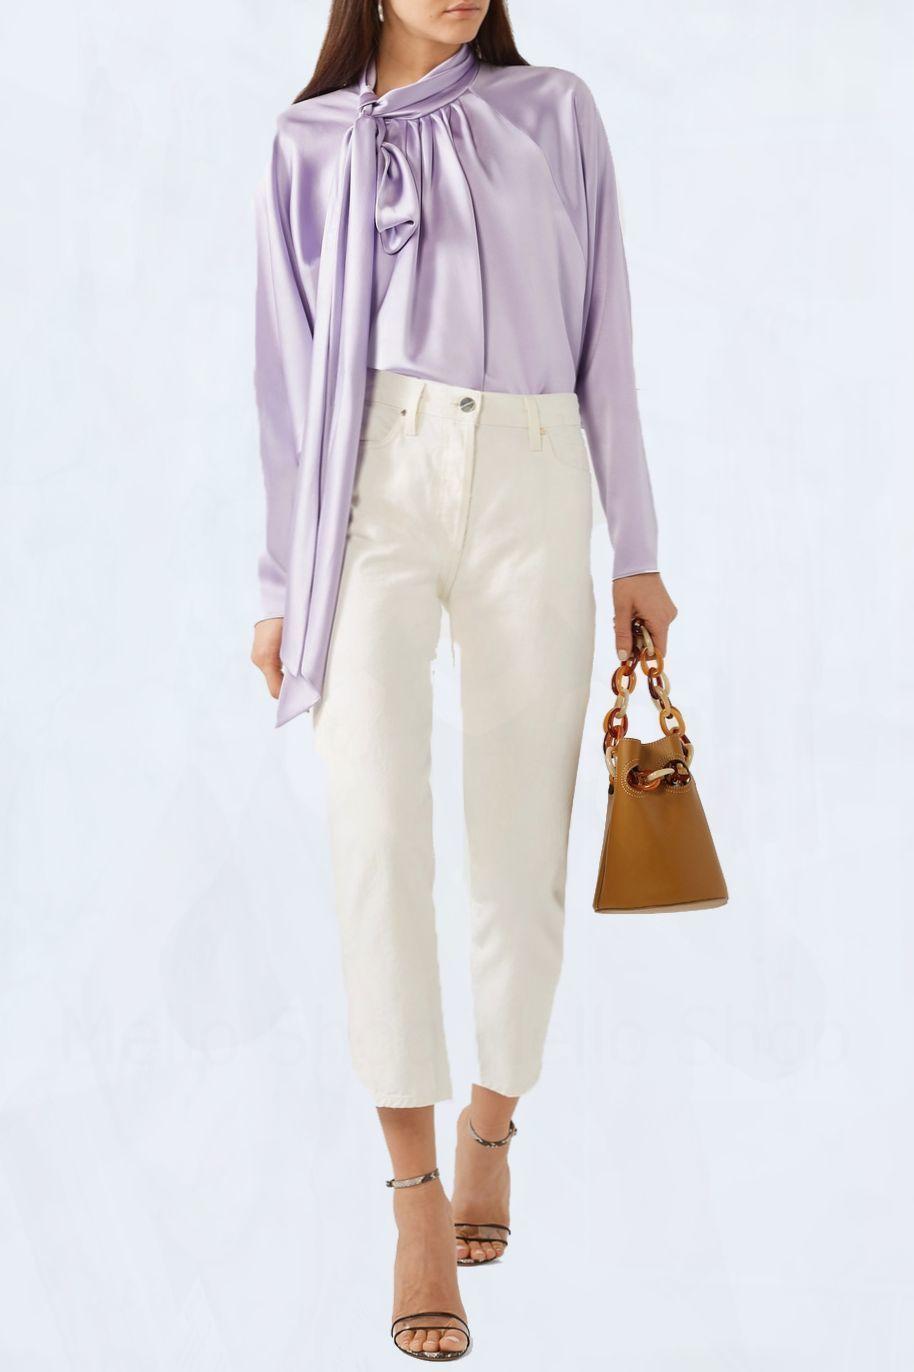 Атласная блузка красивая, Блузки, Оренбург,  Фото №1